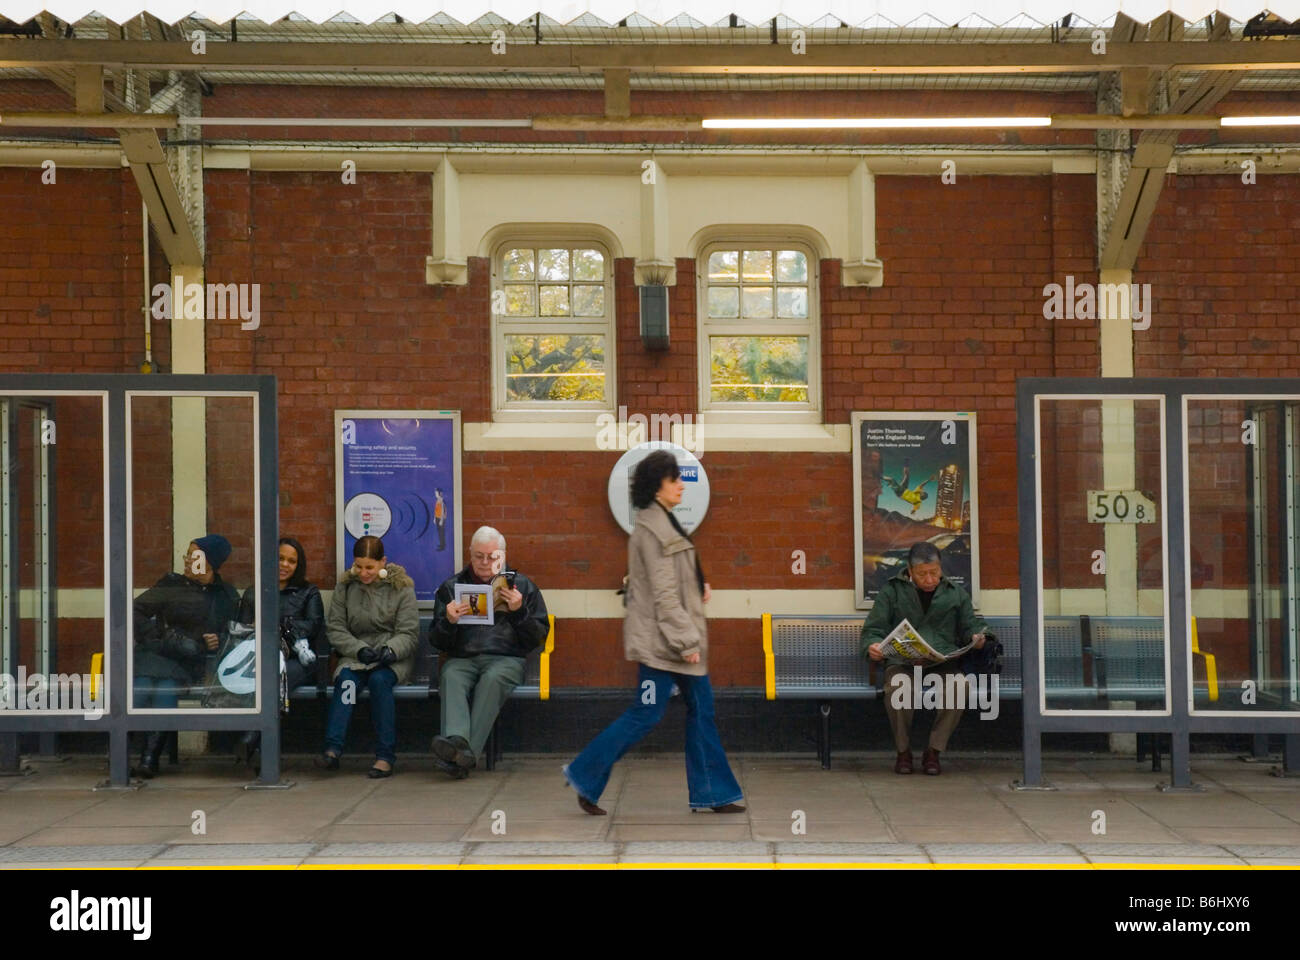 People at Ladbroke Grove tube station in West London England UK Stock Photo